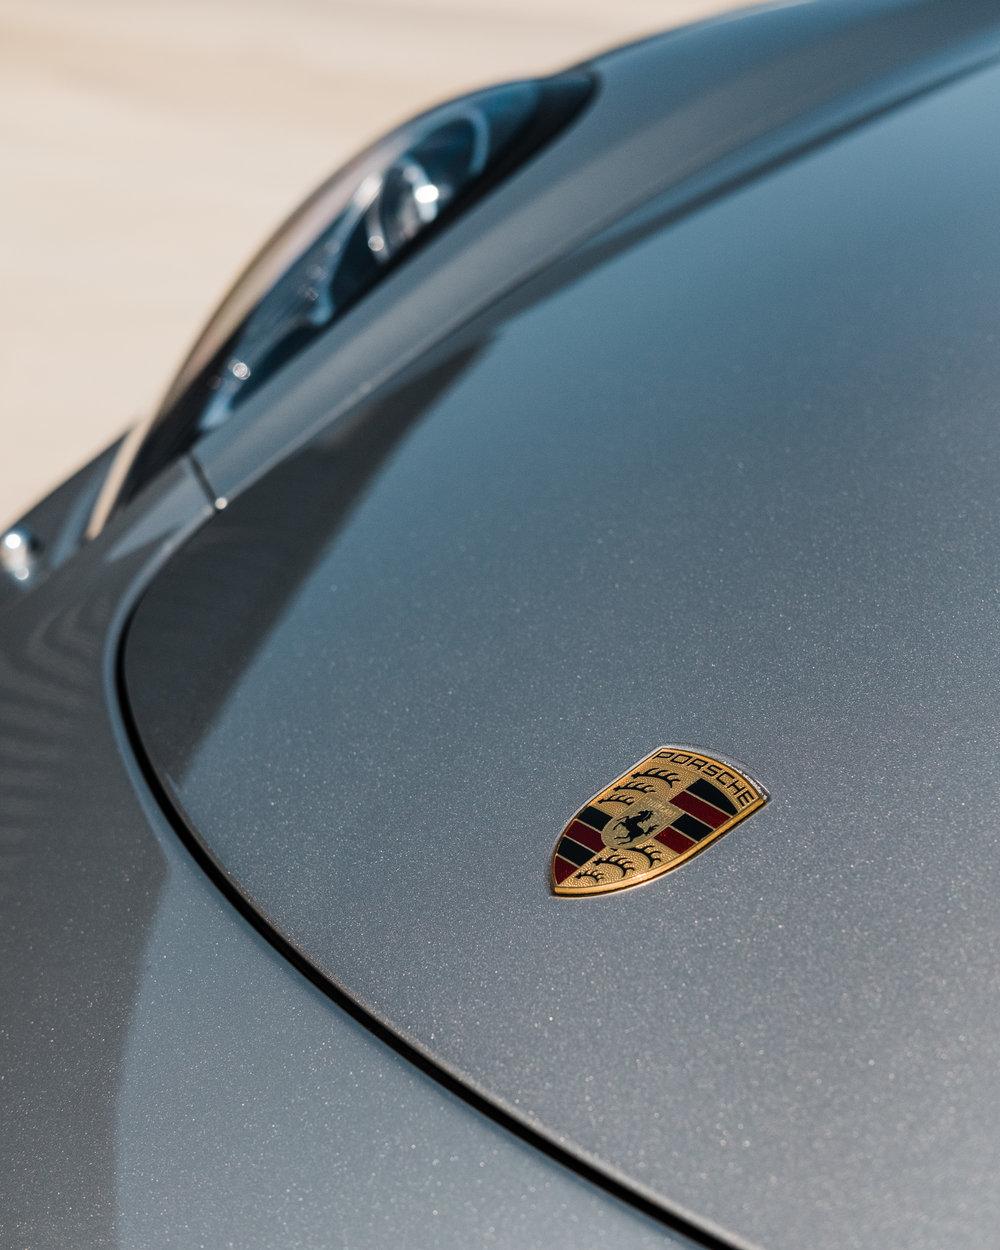 Porsche Cayman  - Ceramic Pro - Ceramic Coating - Paint Correction - Griot's Garage - Wichita Clear Bra-143.jpg